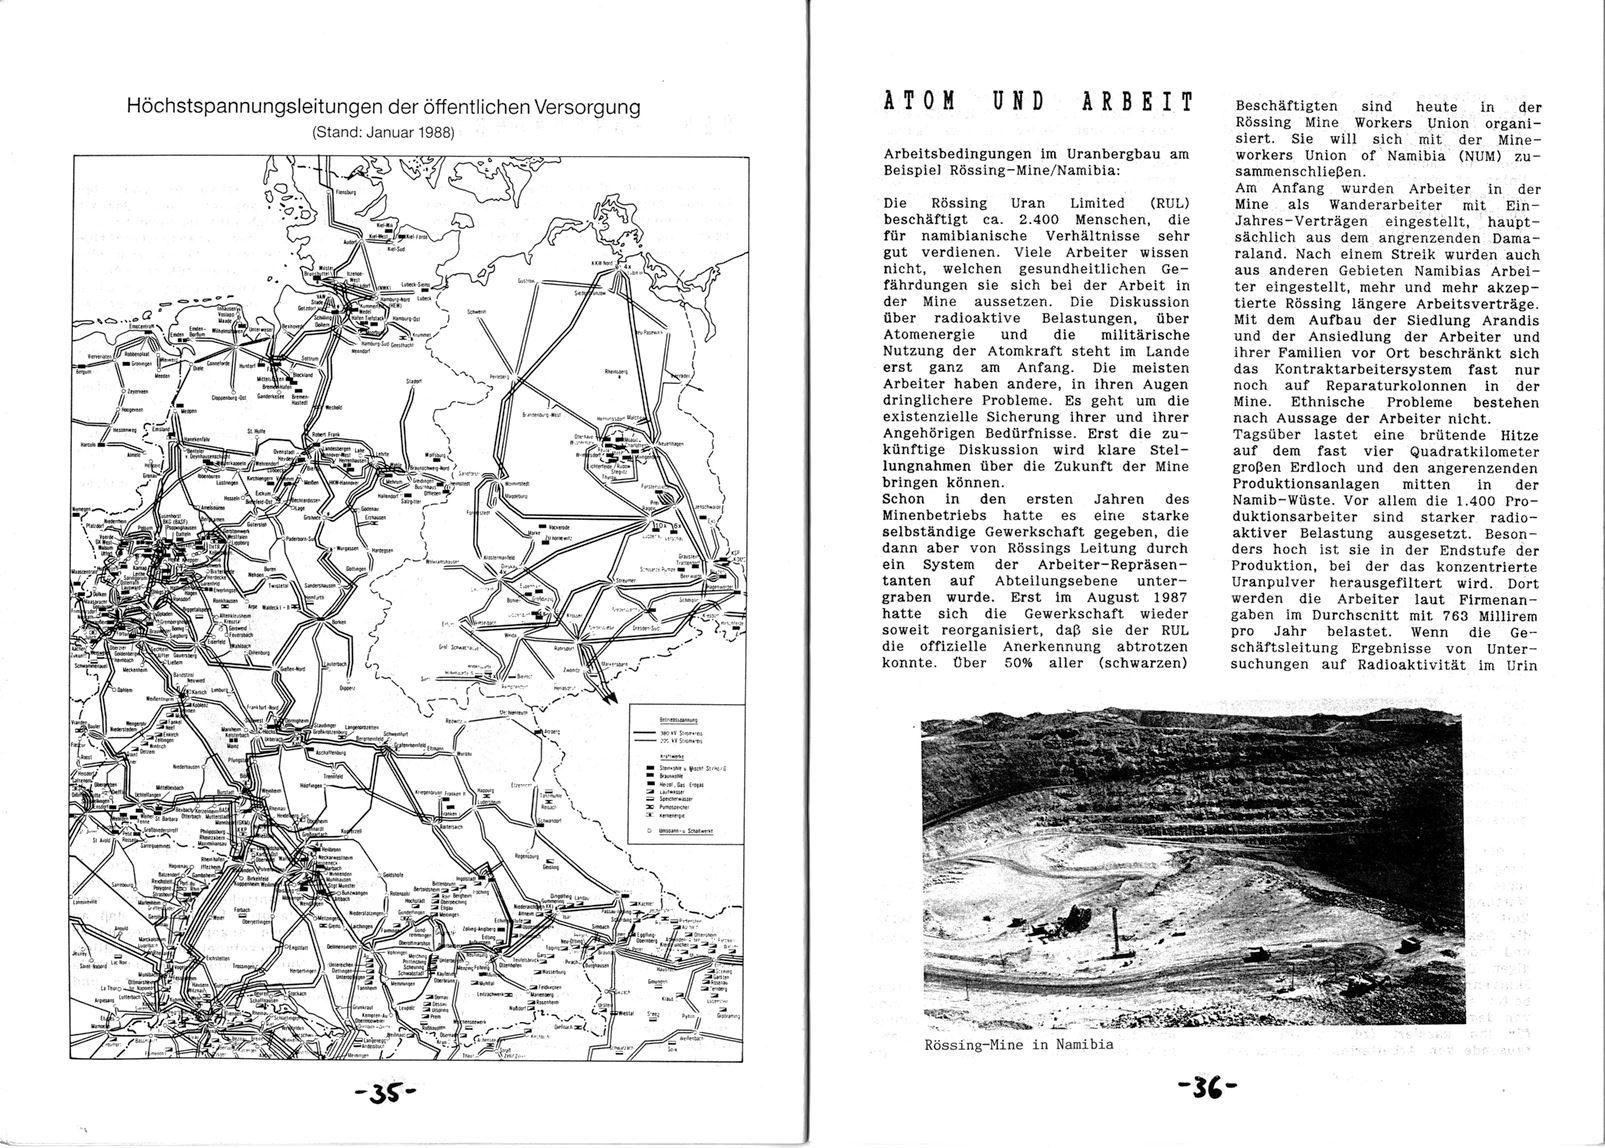 Hamburg_Atomtransporte_19900200_019